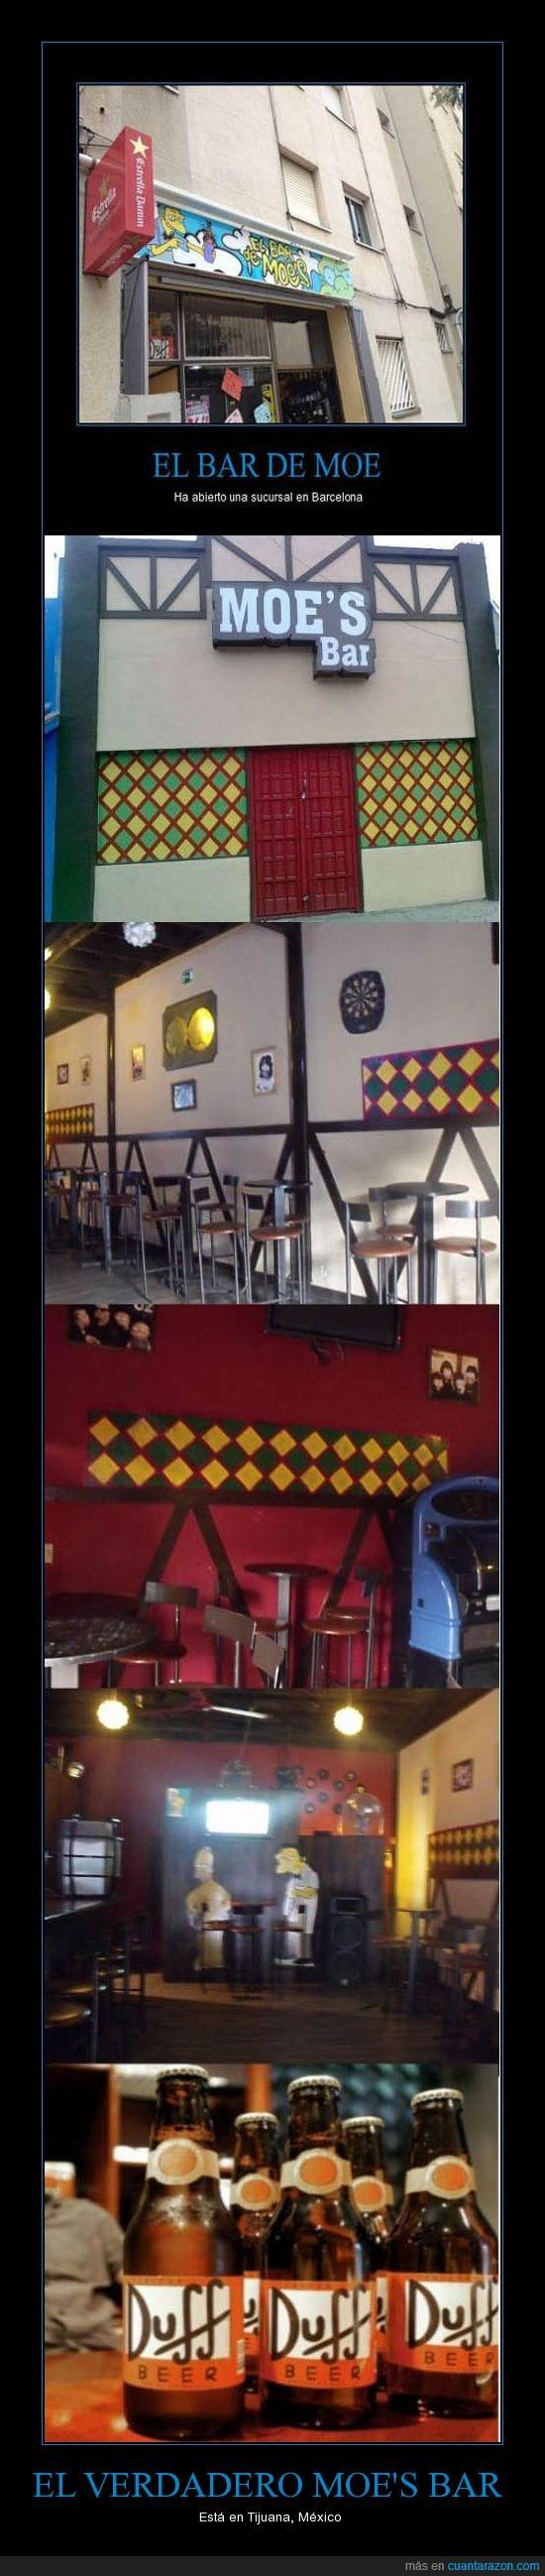 Bar,Mexico,Moes,Simpsons,Tijuana